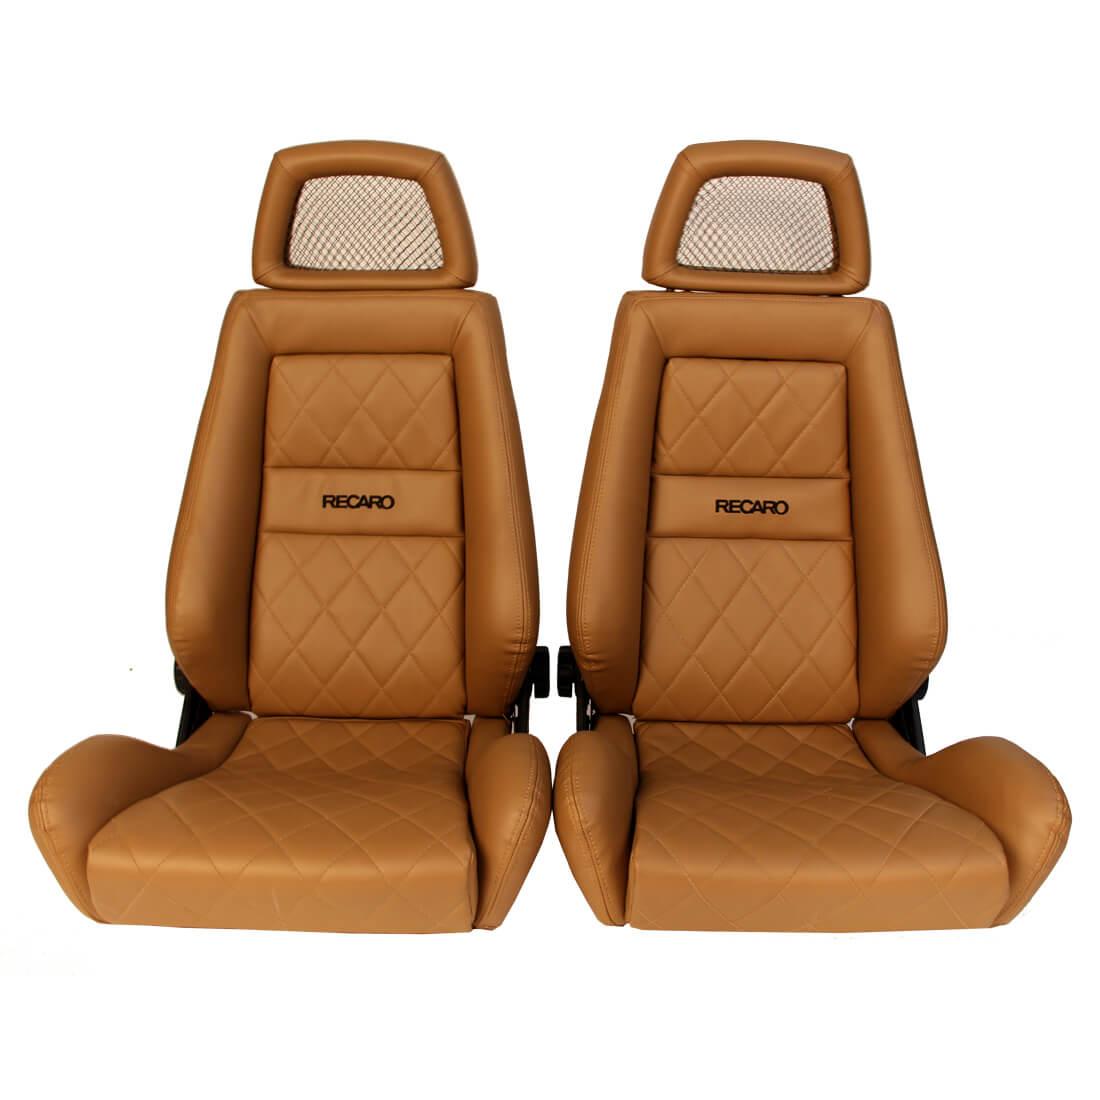 2 Used Jdm Recaro Lx Net Headrest Tan Synthetic Leather Seats Racing Honda Porsche Auto Cars Mck